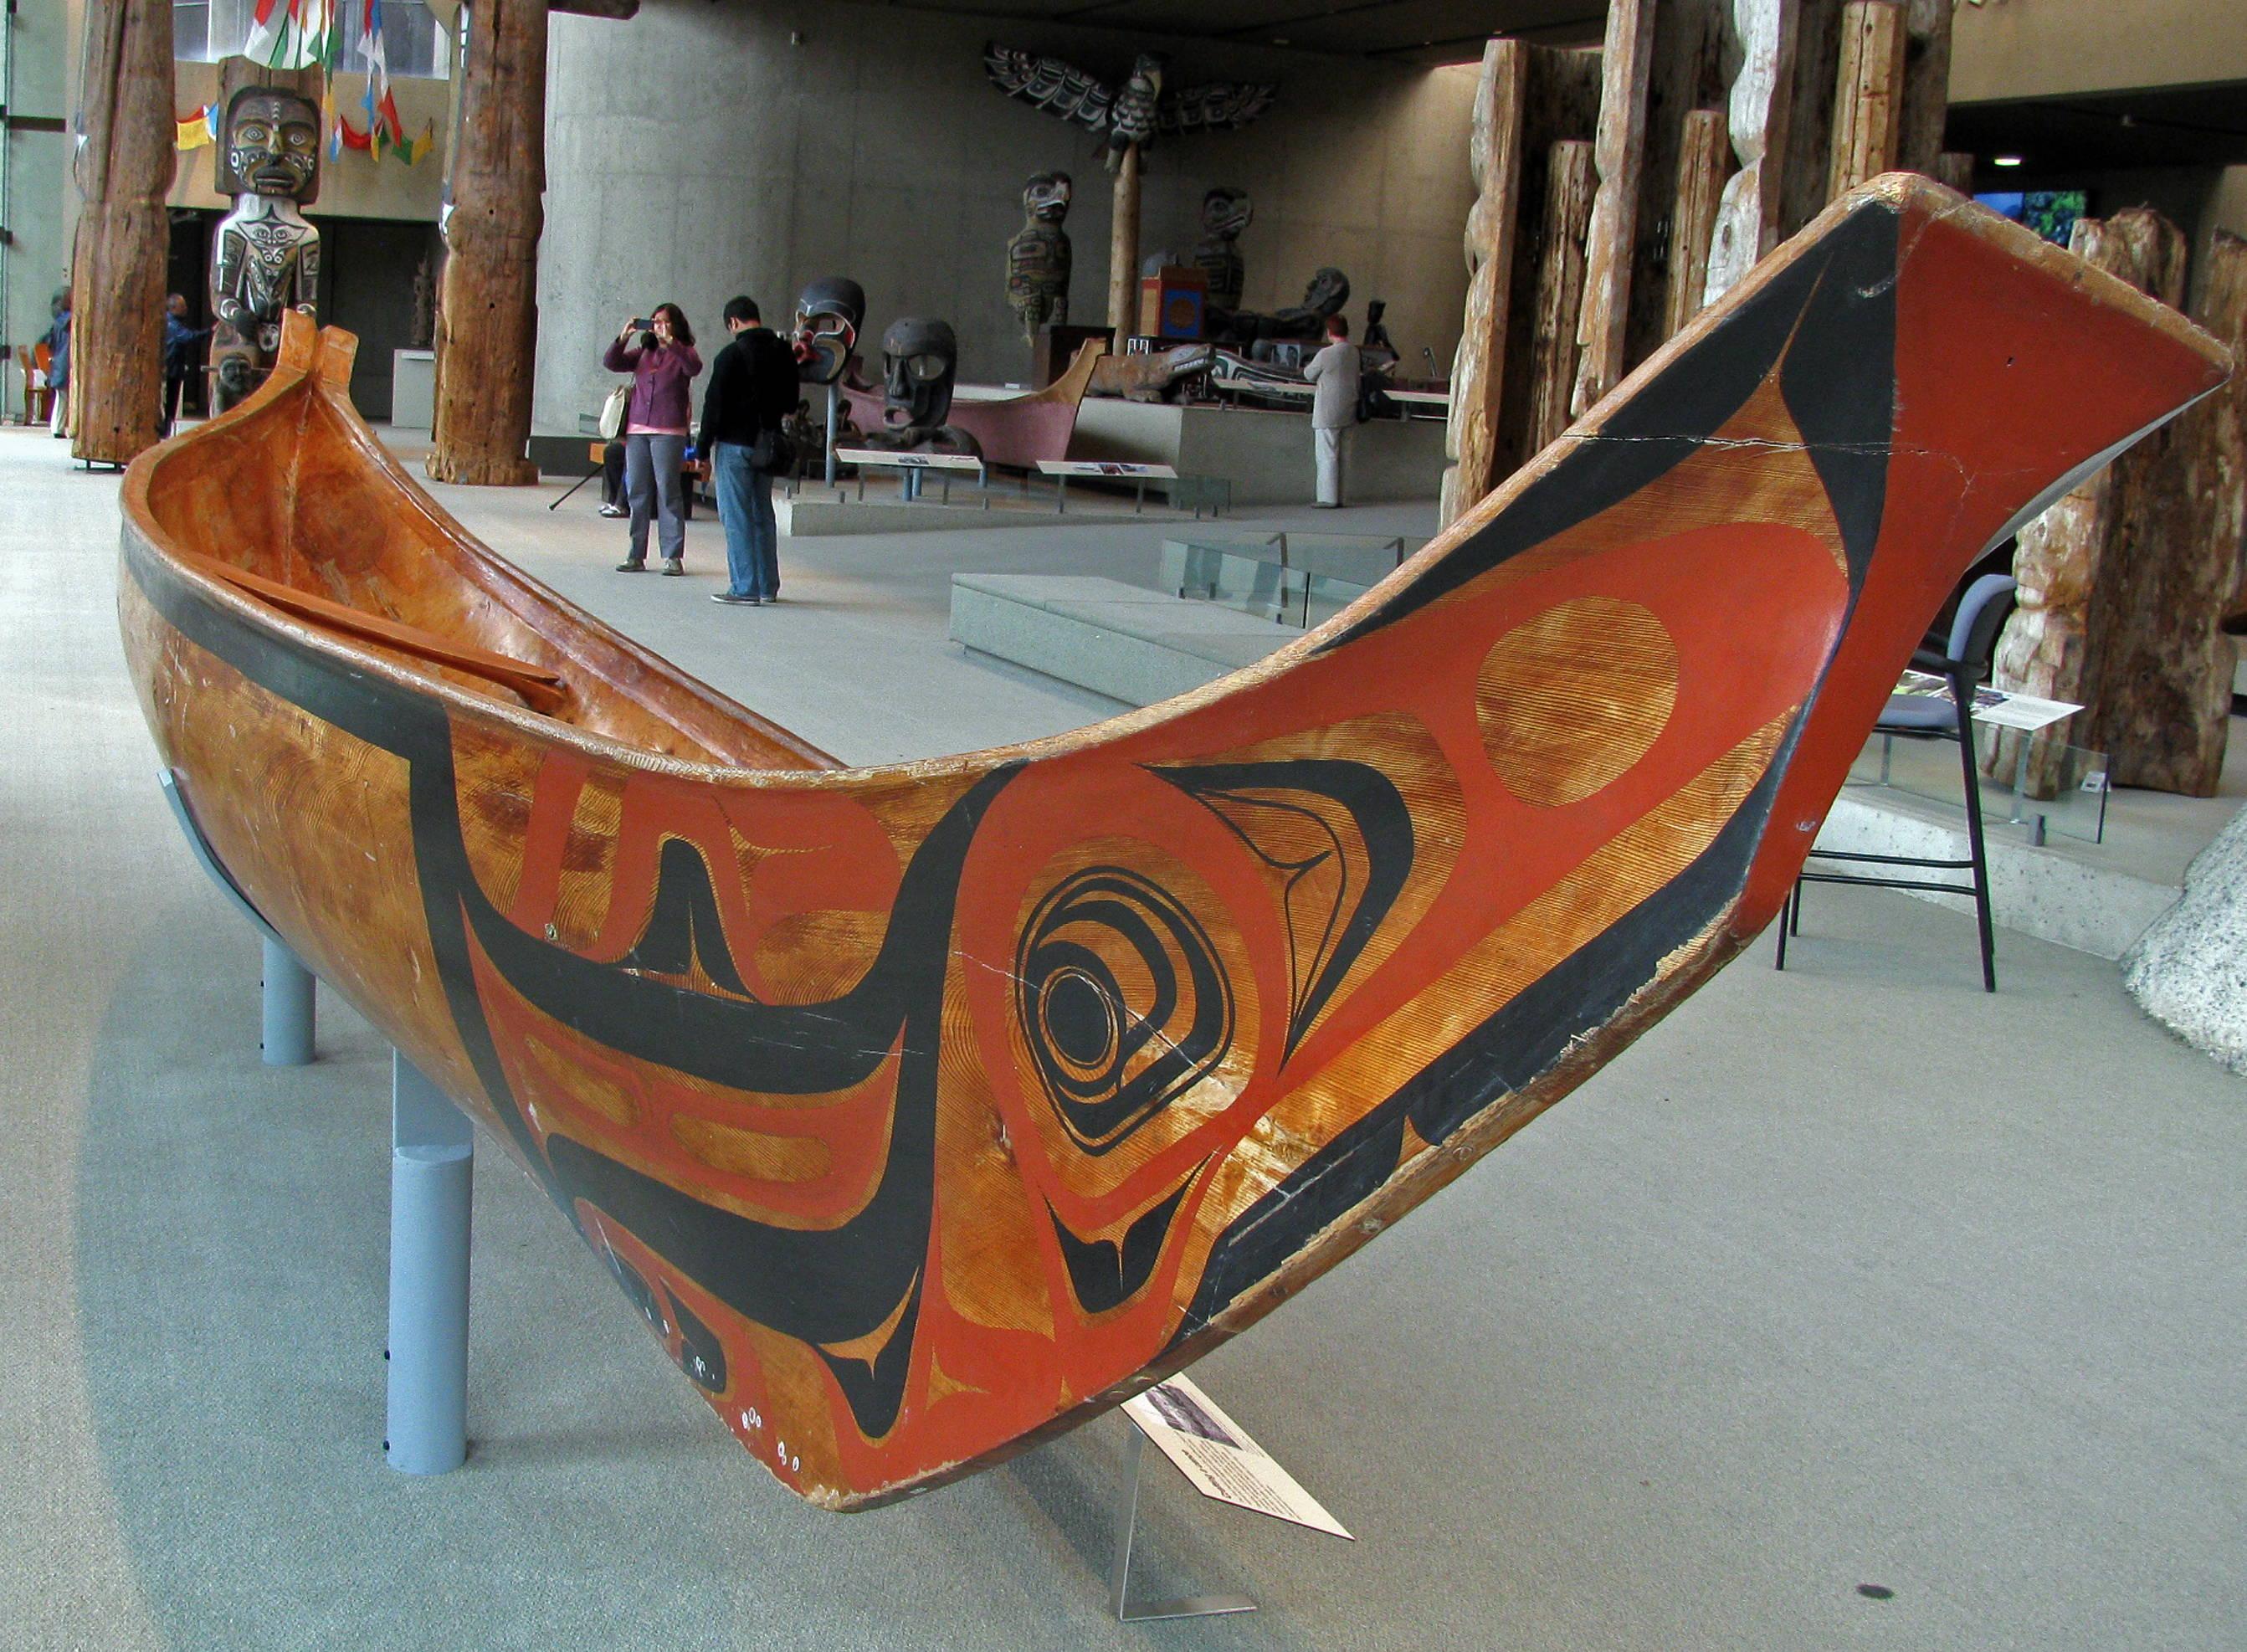 Full size northern style Tluu dugout canoe